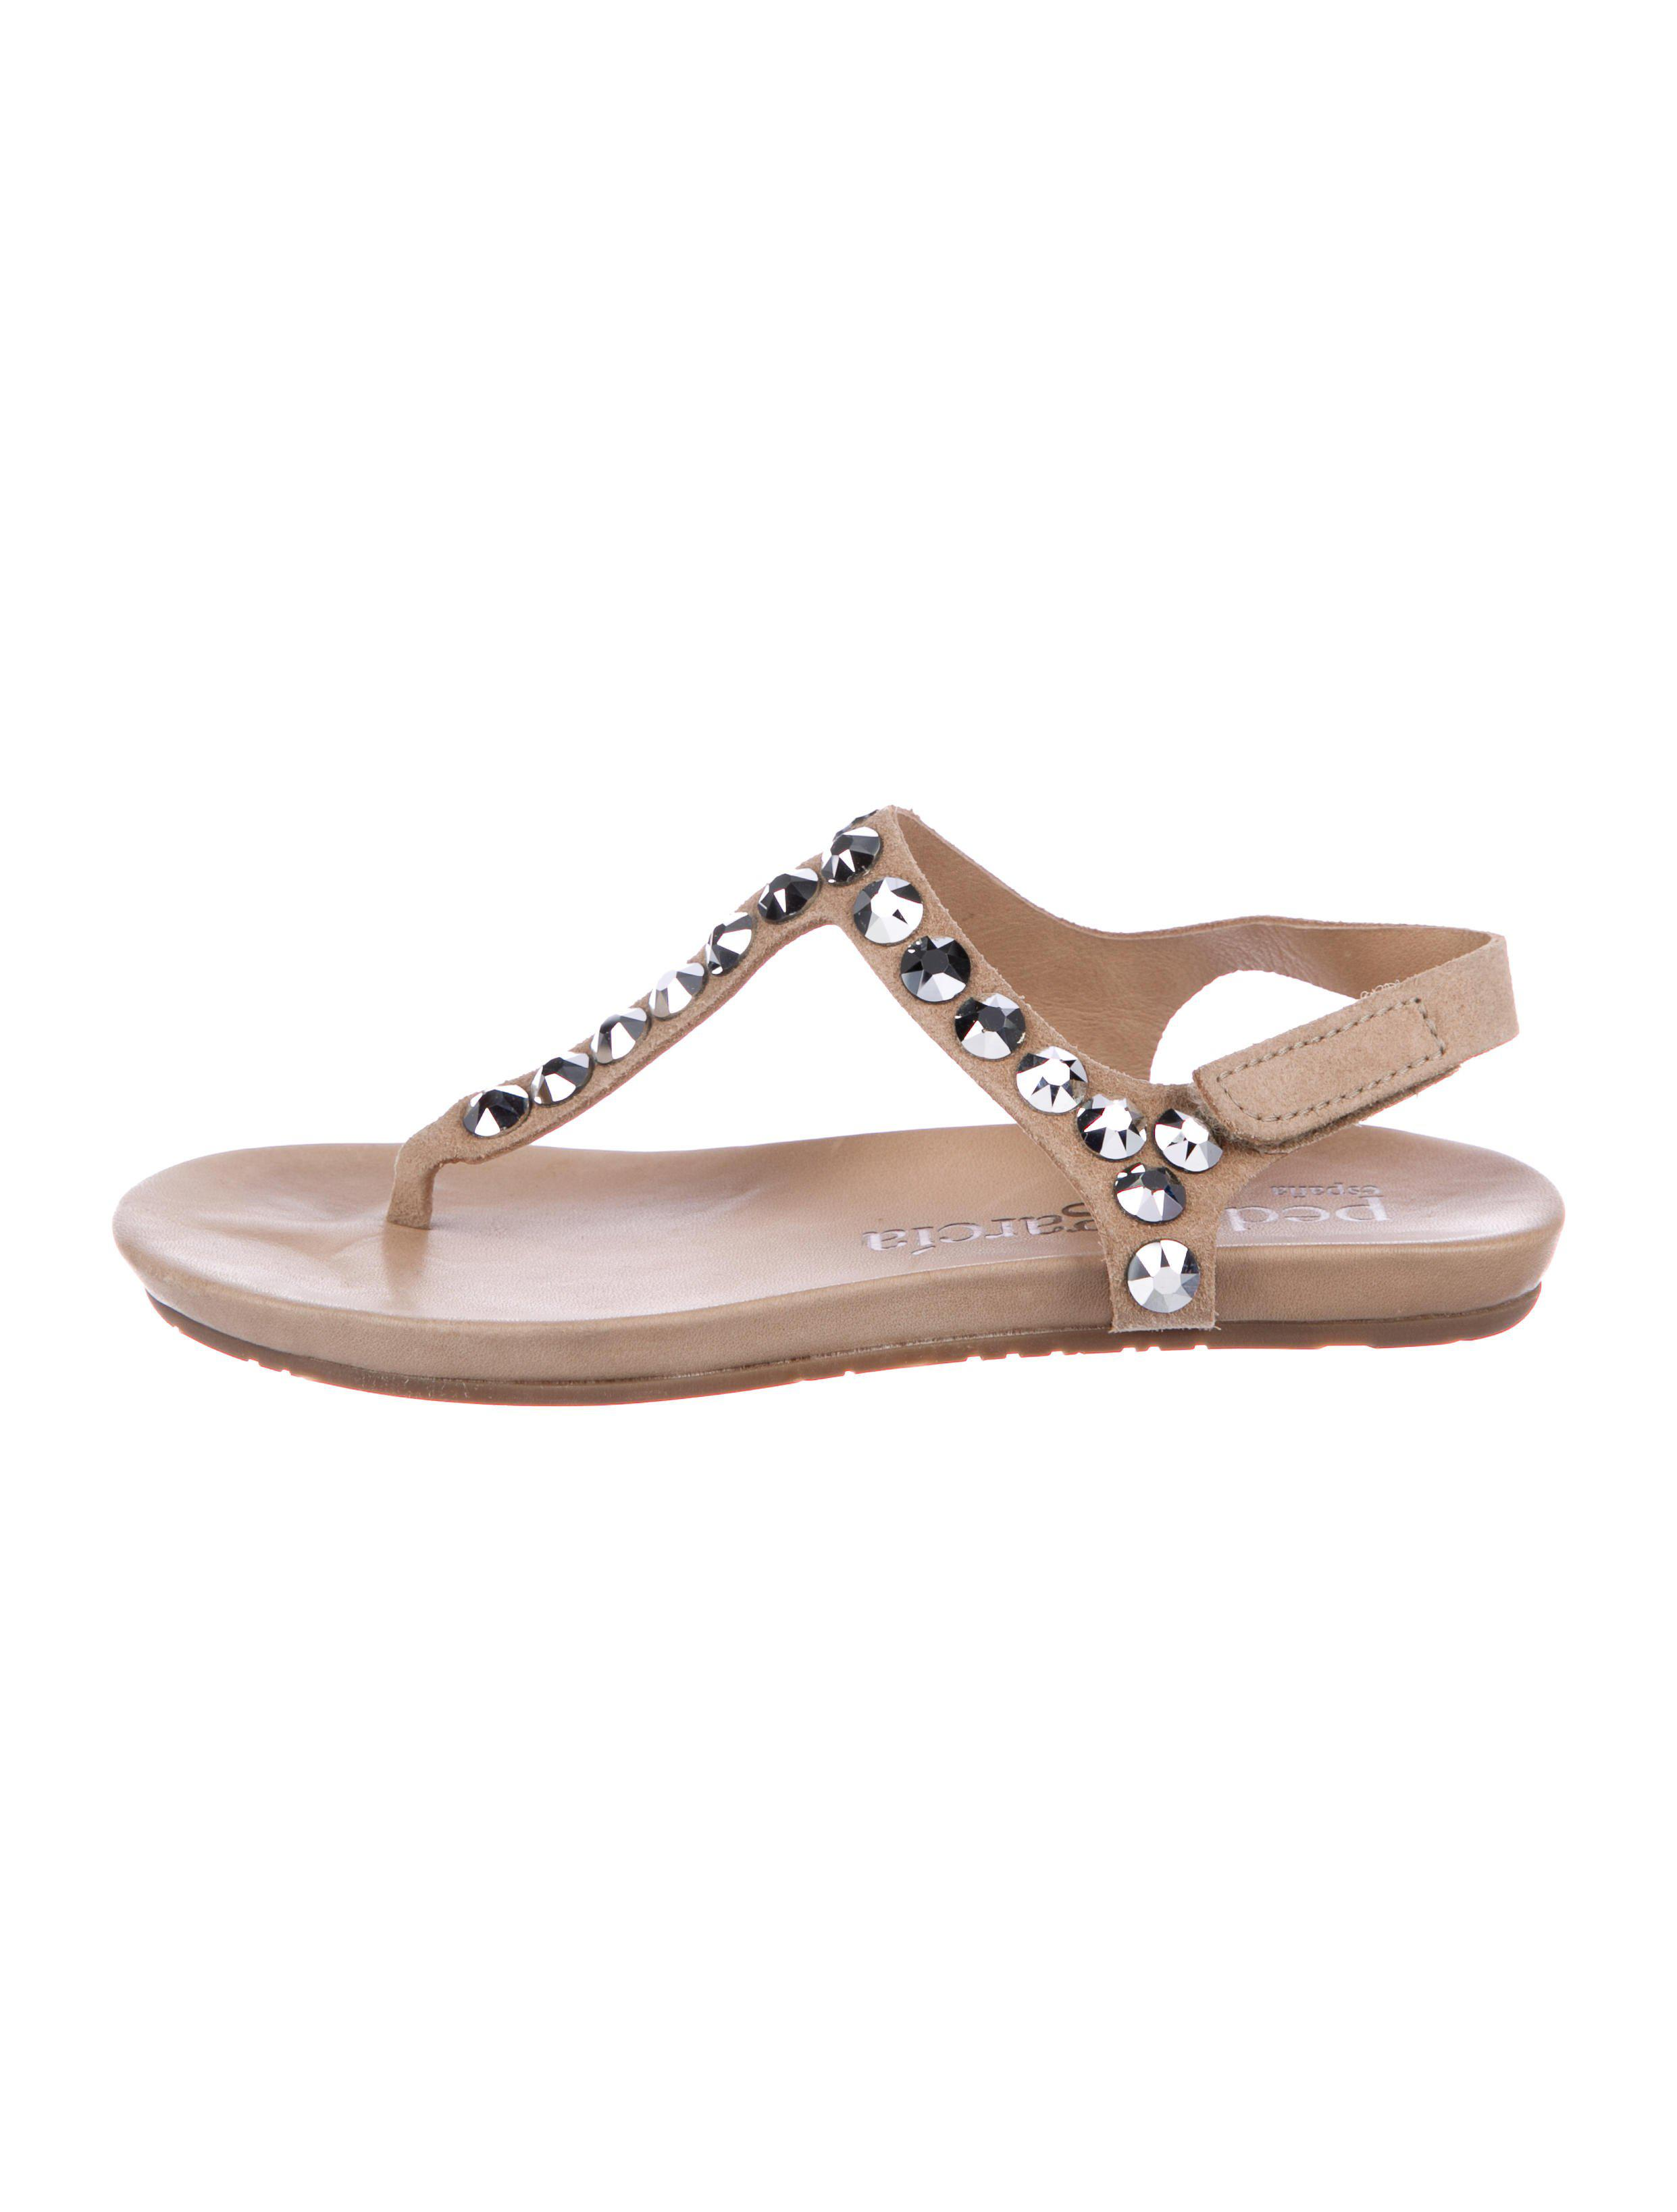 afbdc369c12eca Lyst - Pedro Garcia Suede Embellished Sandals Tan in Natural